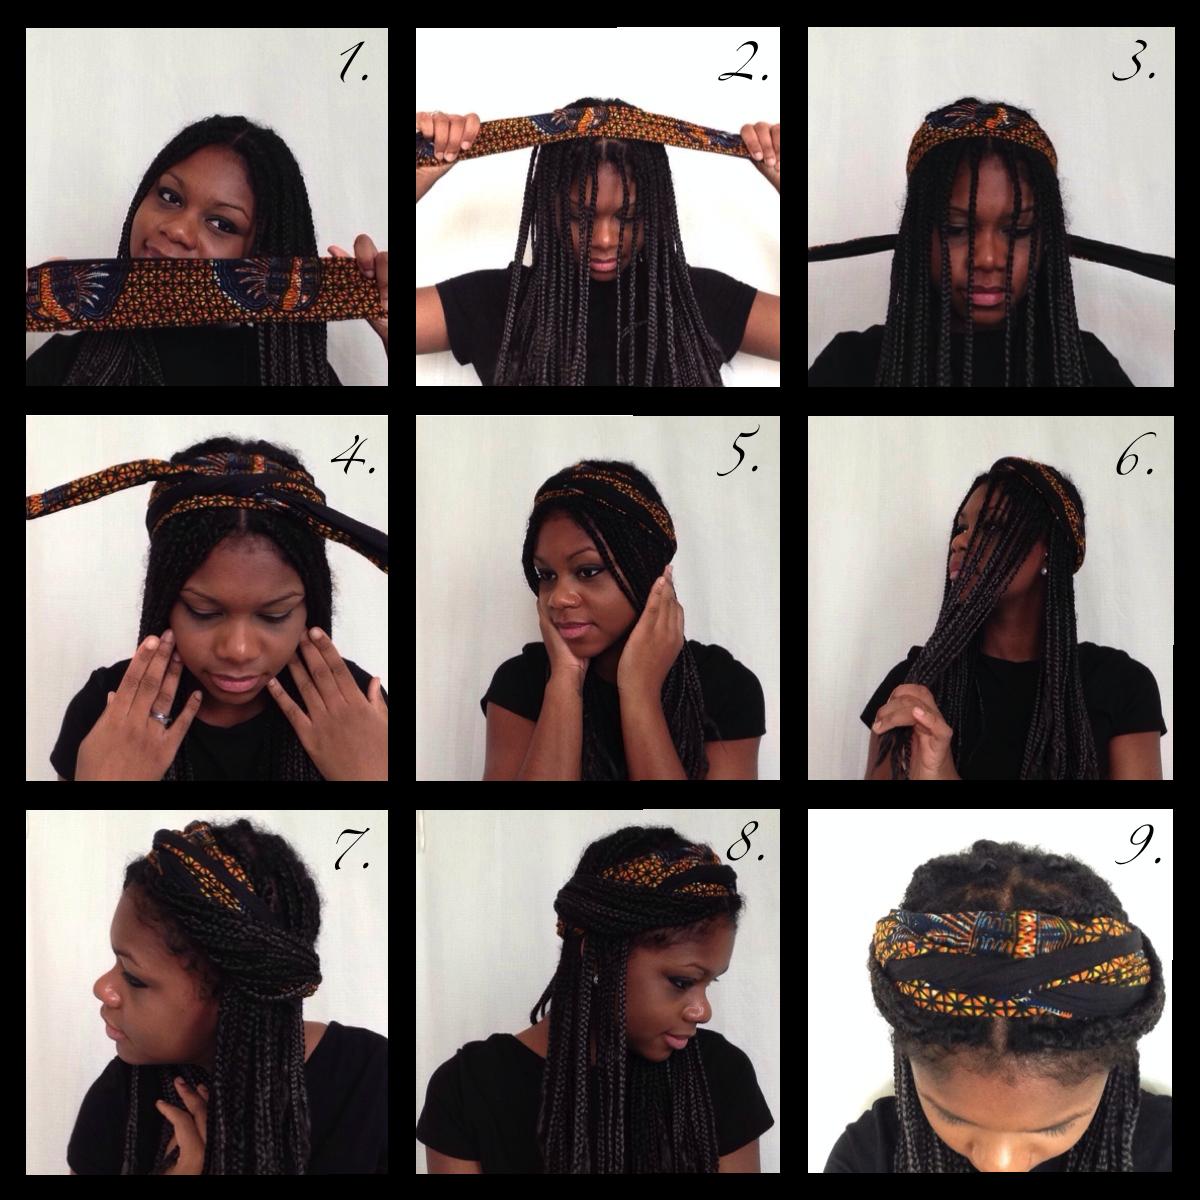 Tuto foulard \u0026 box braids ^^ Tuto Foulard, Coiffure Facile, Idées De  Coiffures